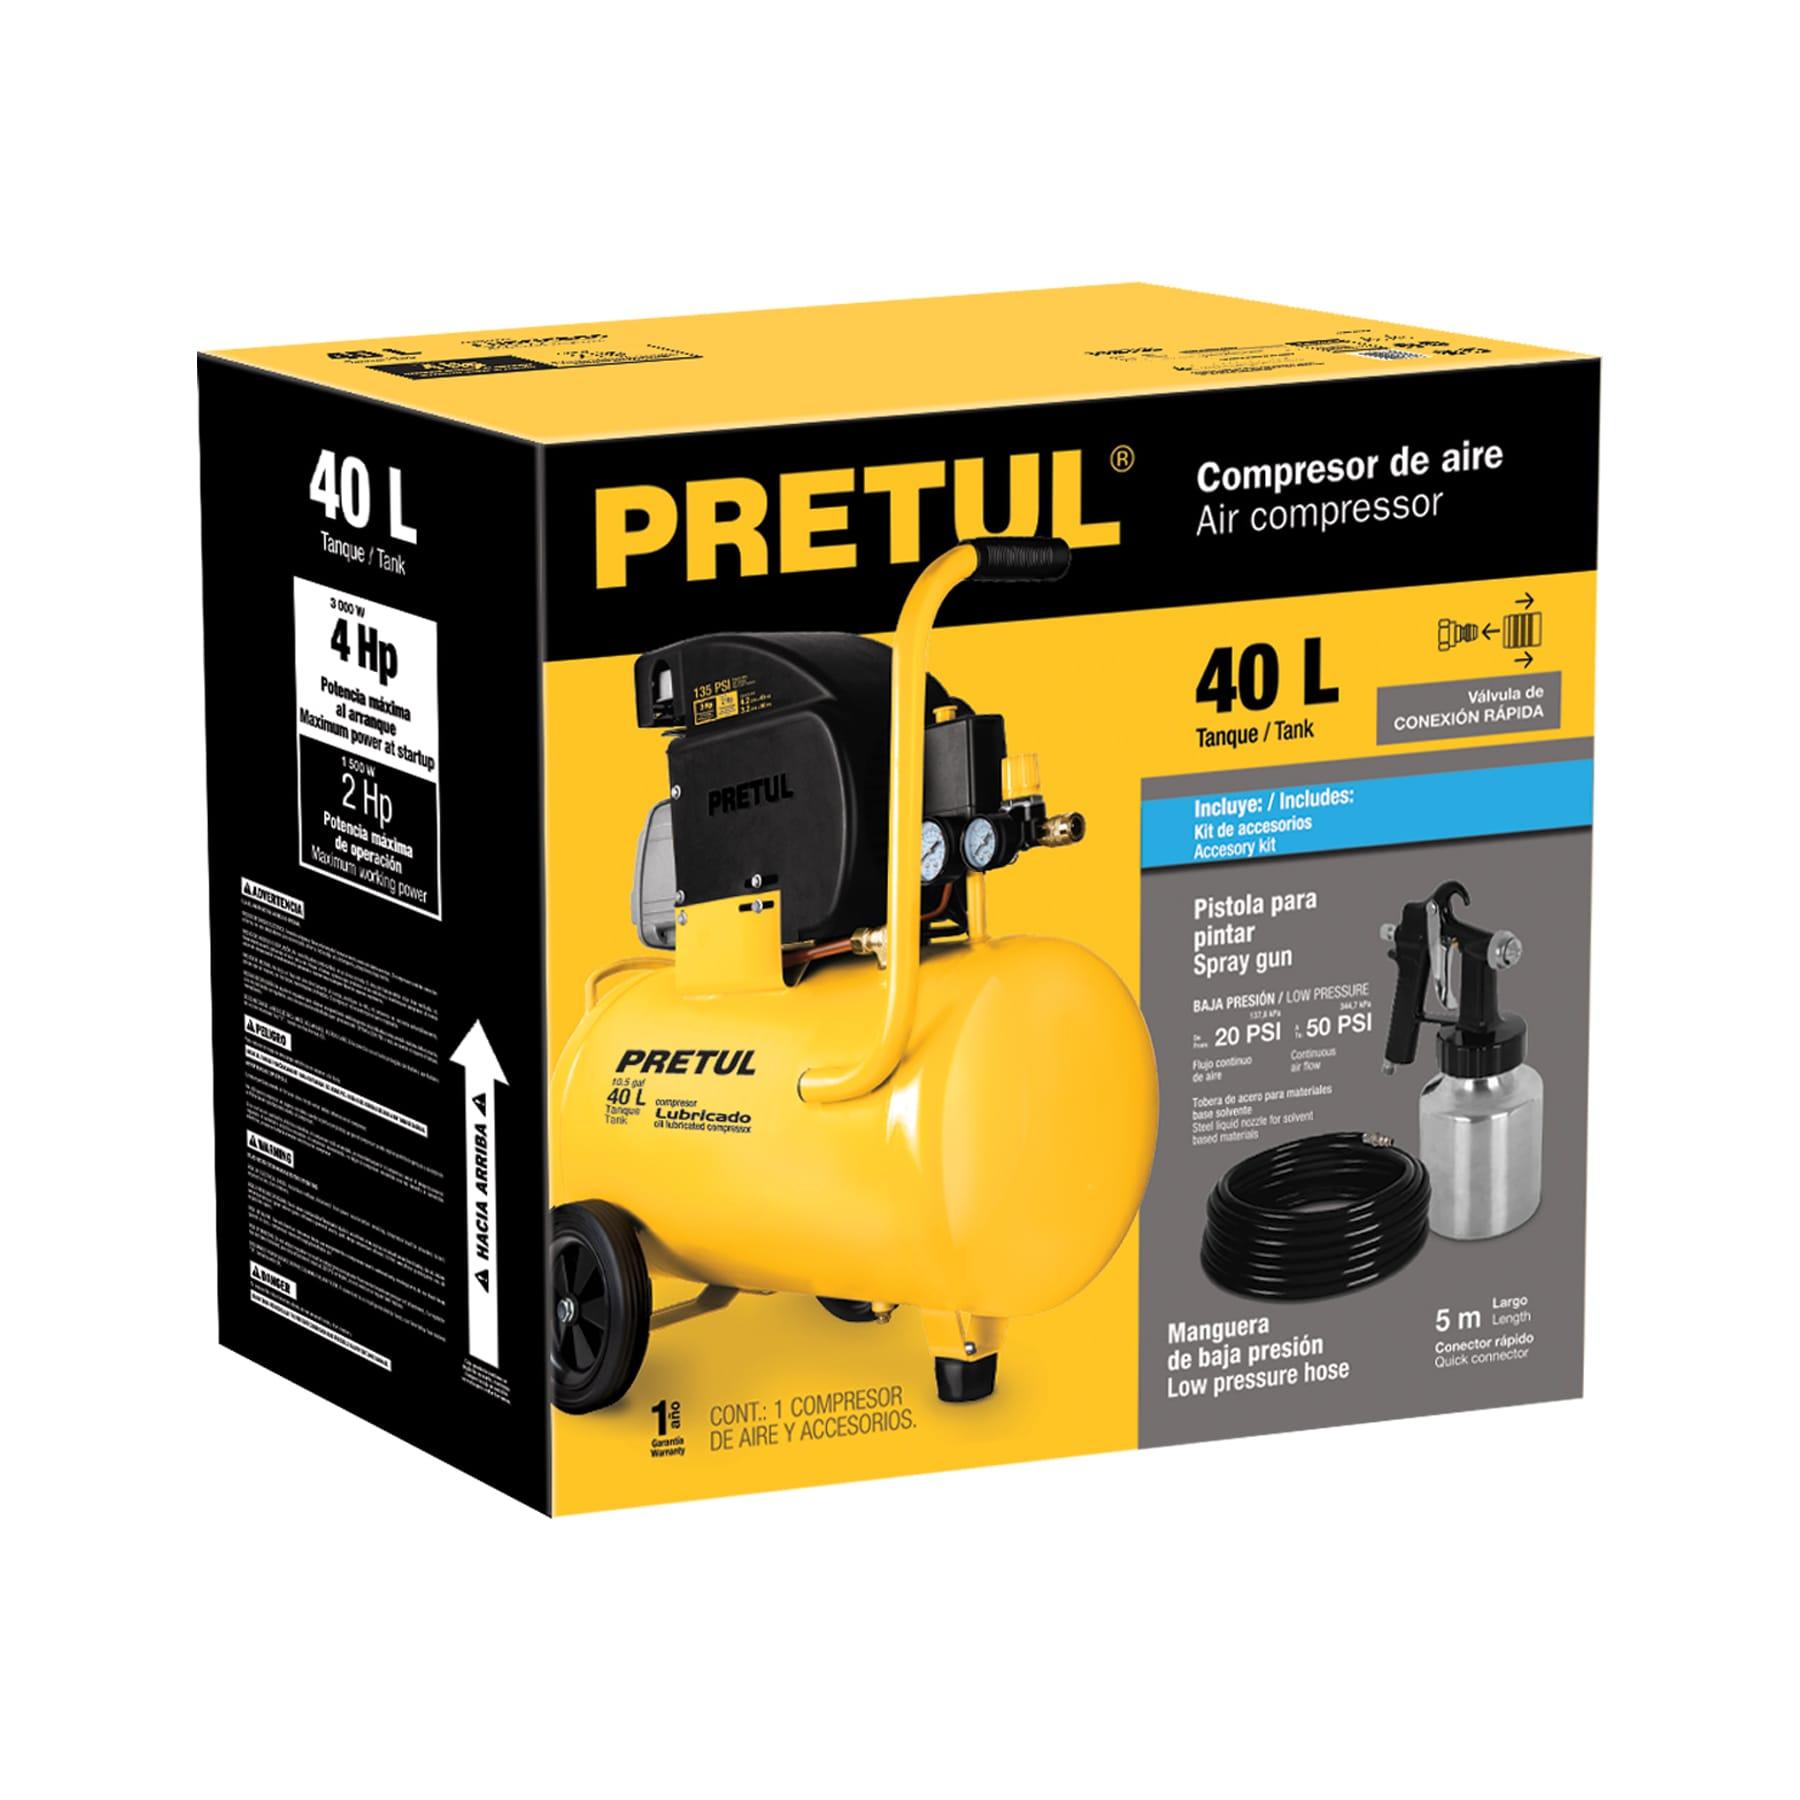 Pretul - Kit, compresor 40 L, manguera de PVC y pistola, Pretul